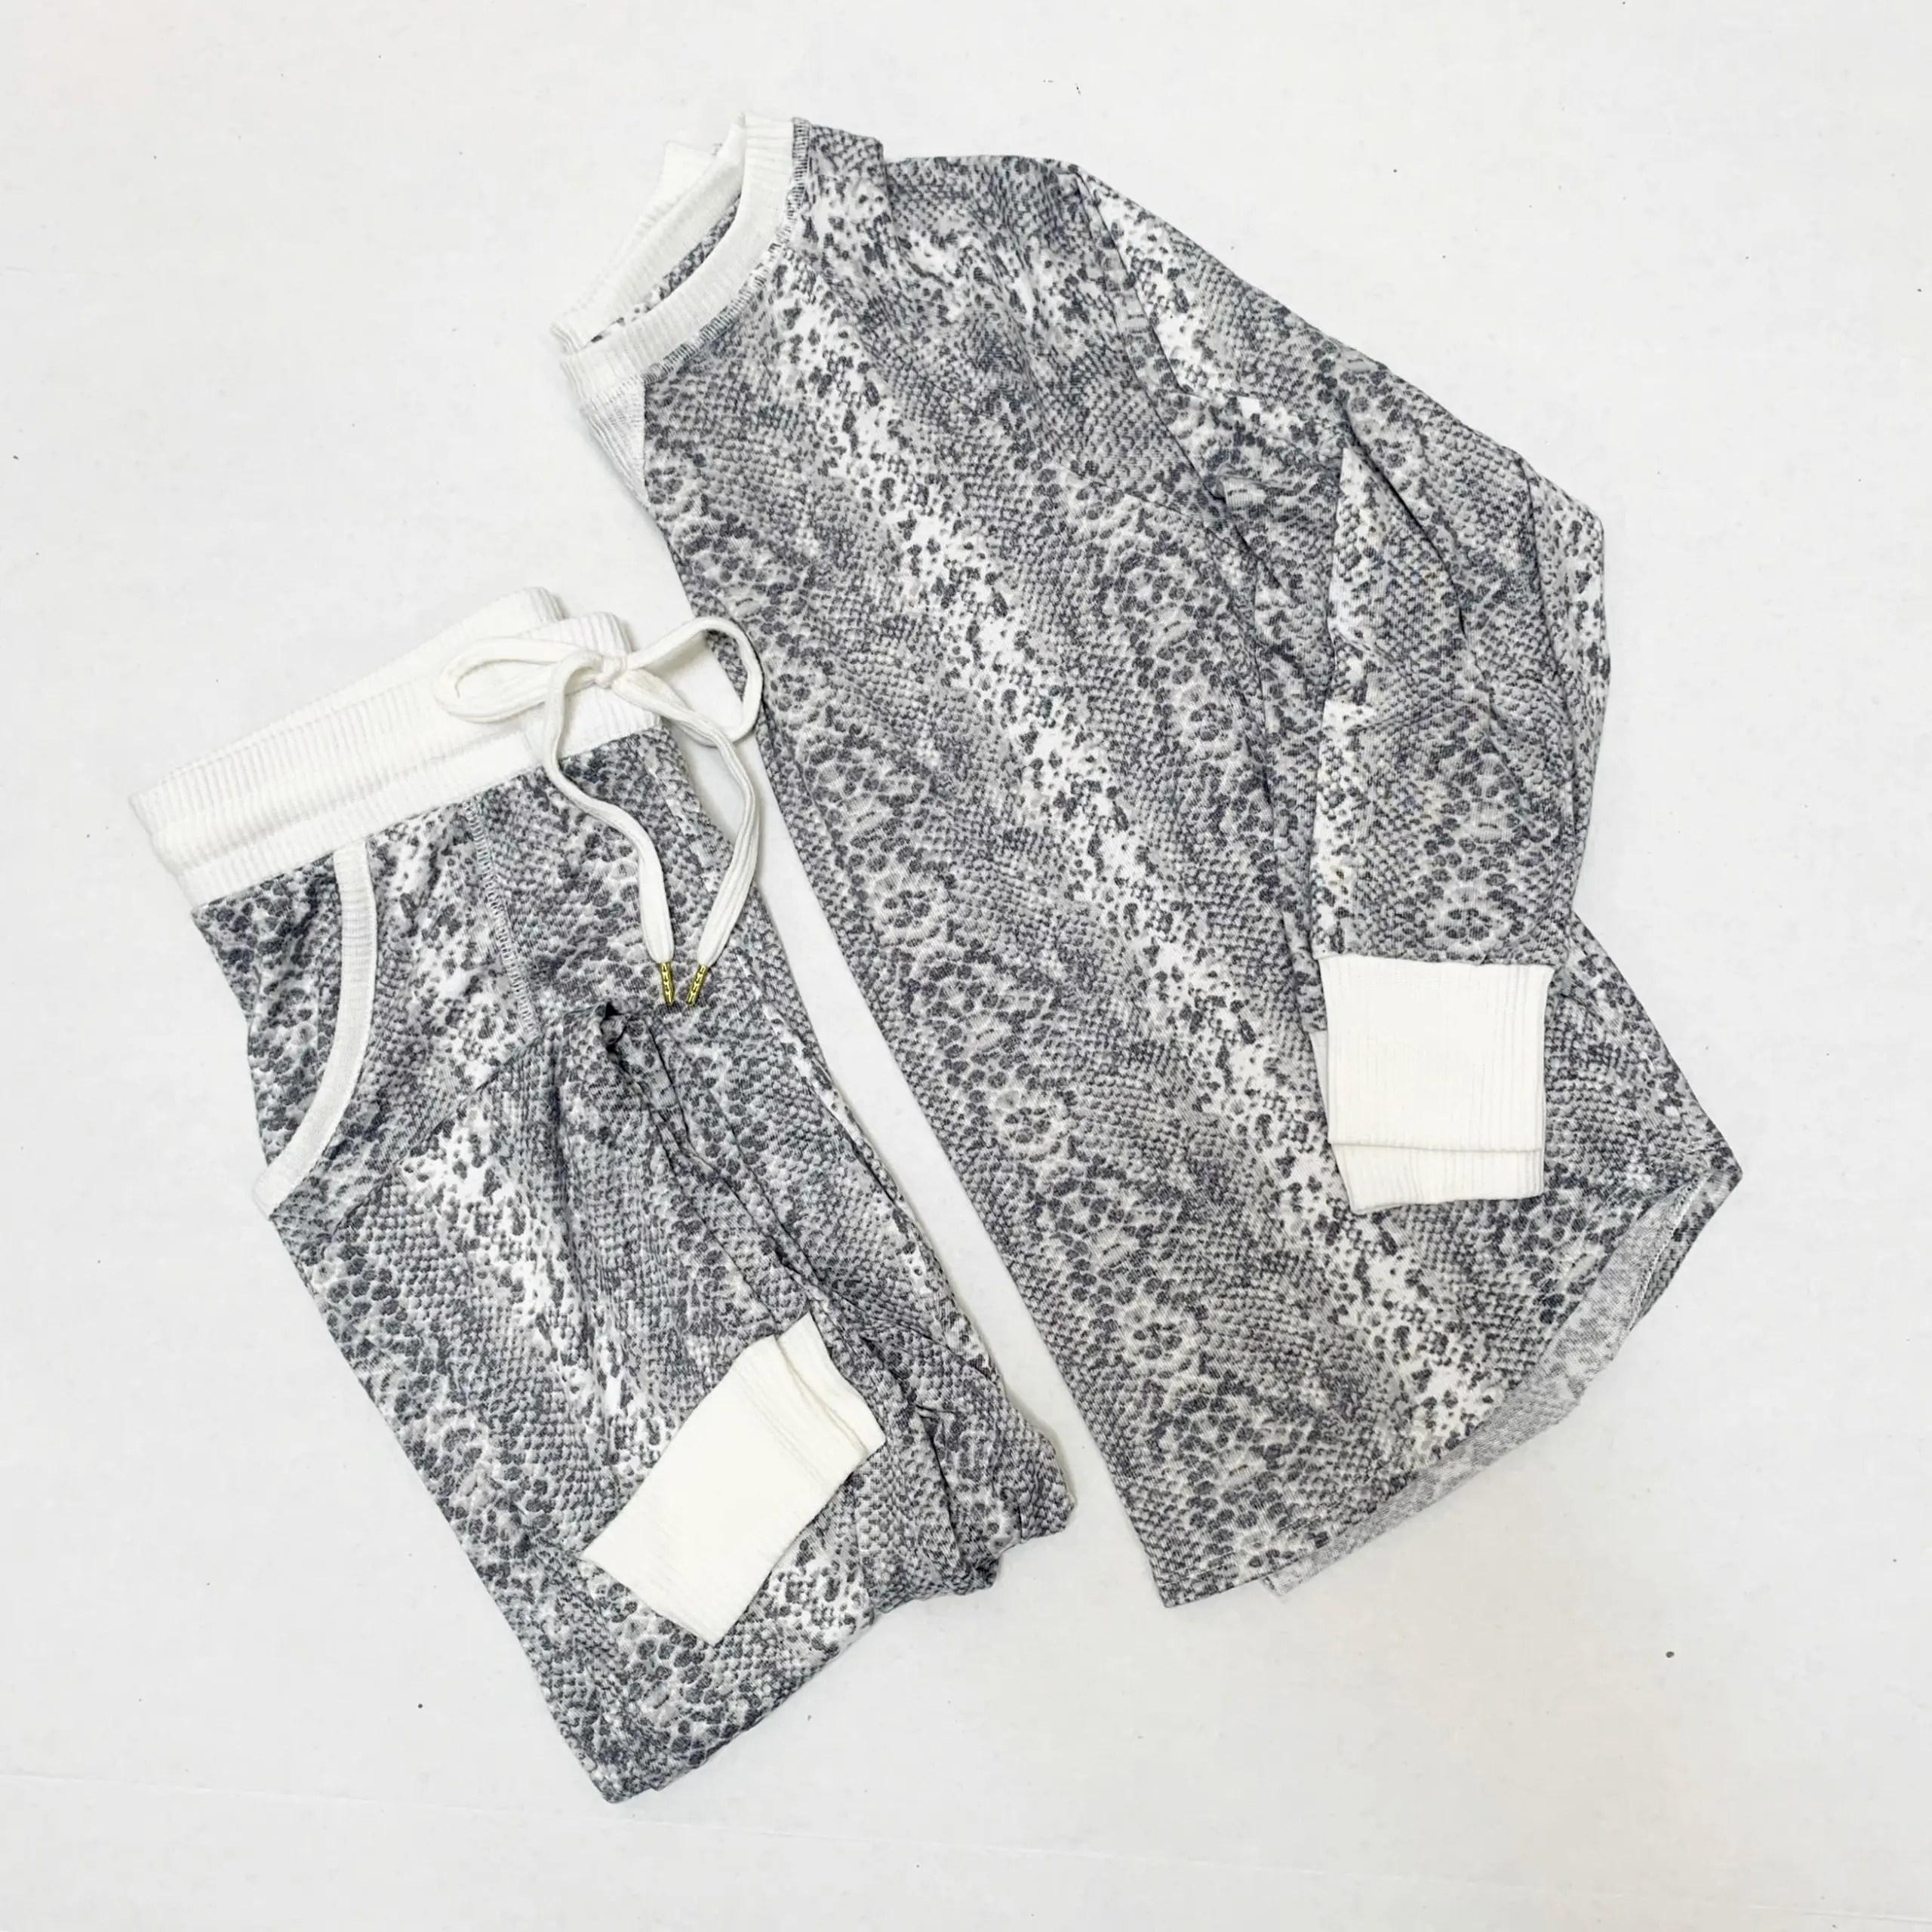 Secret Treasures Women's and Women's Plus Hacci Long Sleeve Top and Joggers, 2-Piece Pajama Set